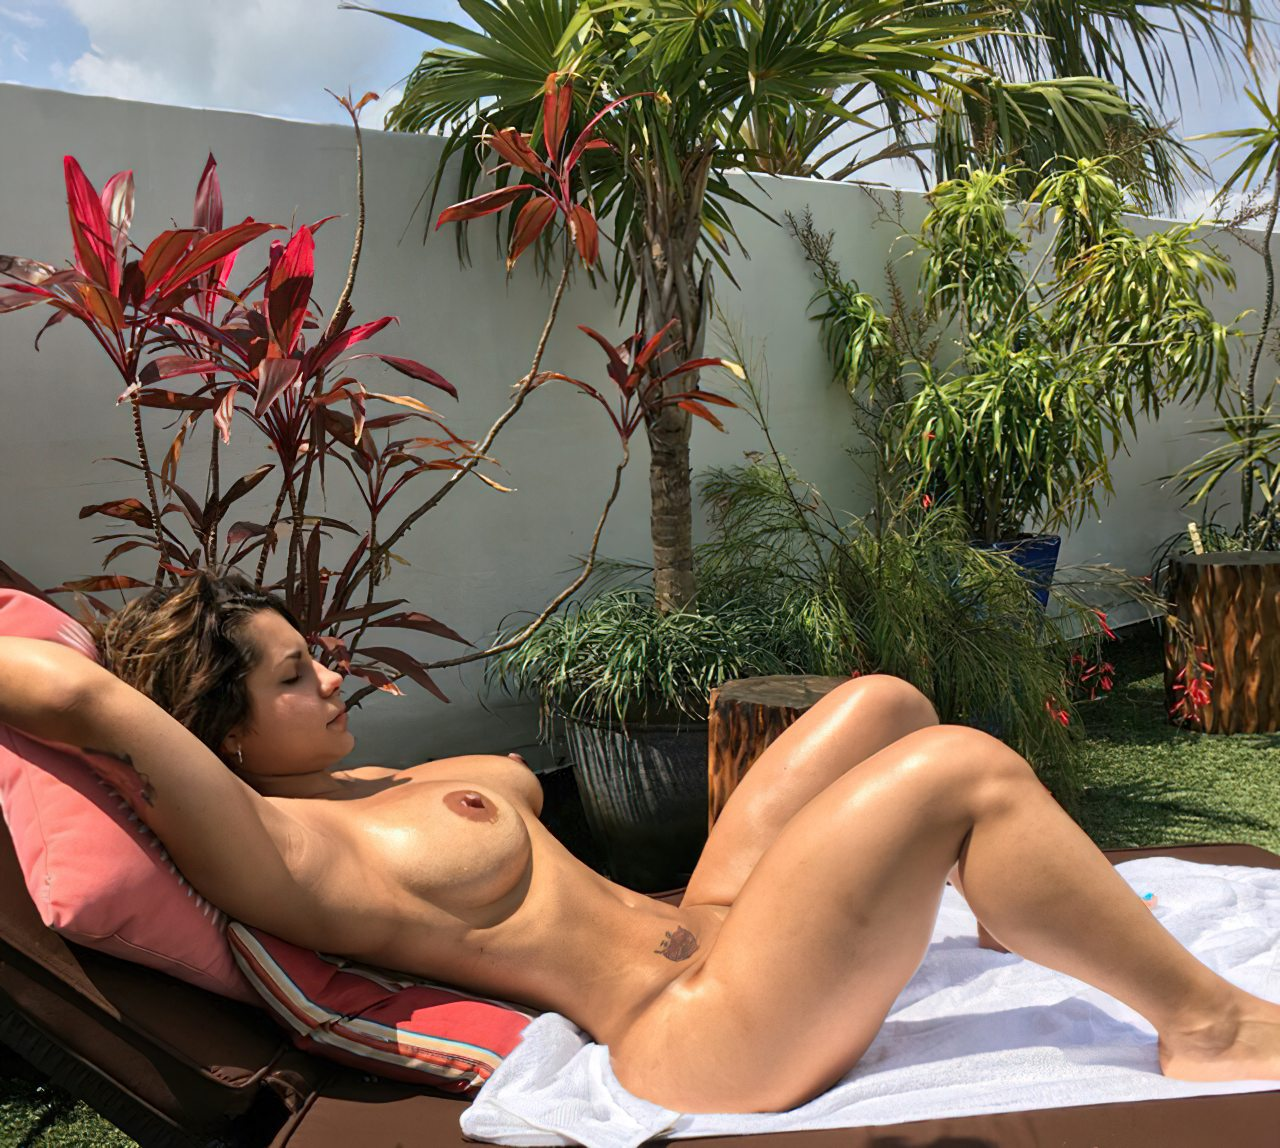 Mulher Gostosa (26)